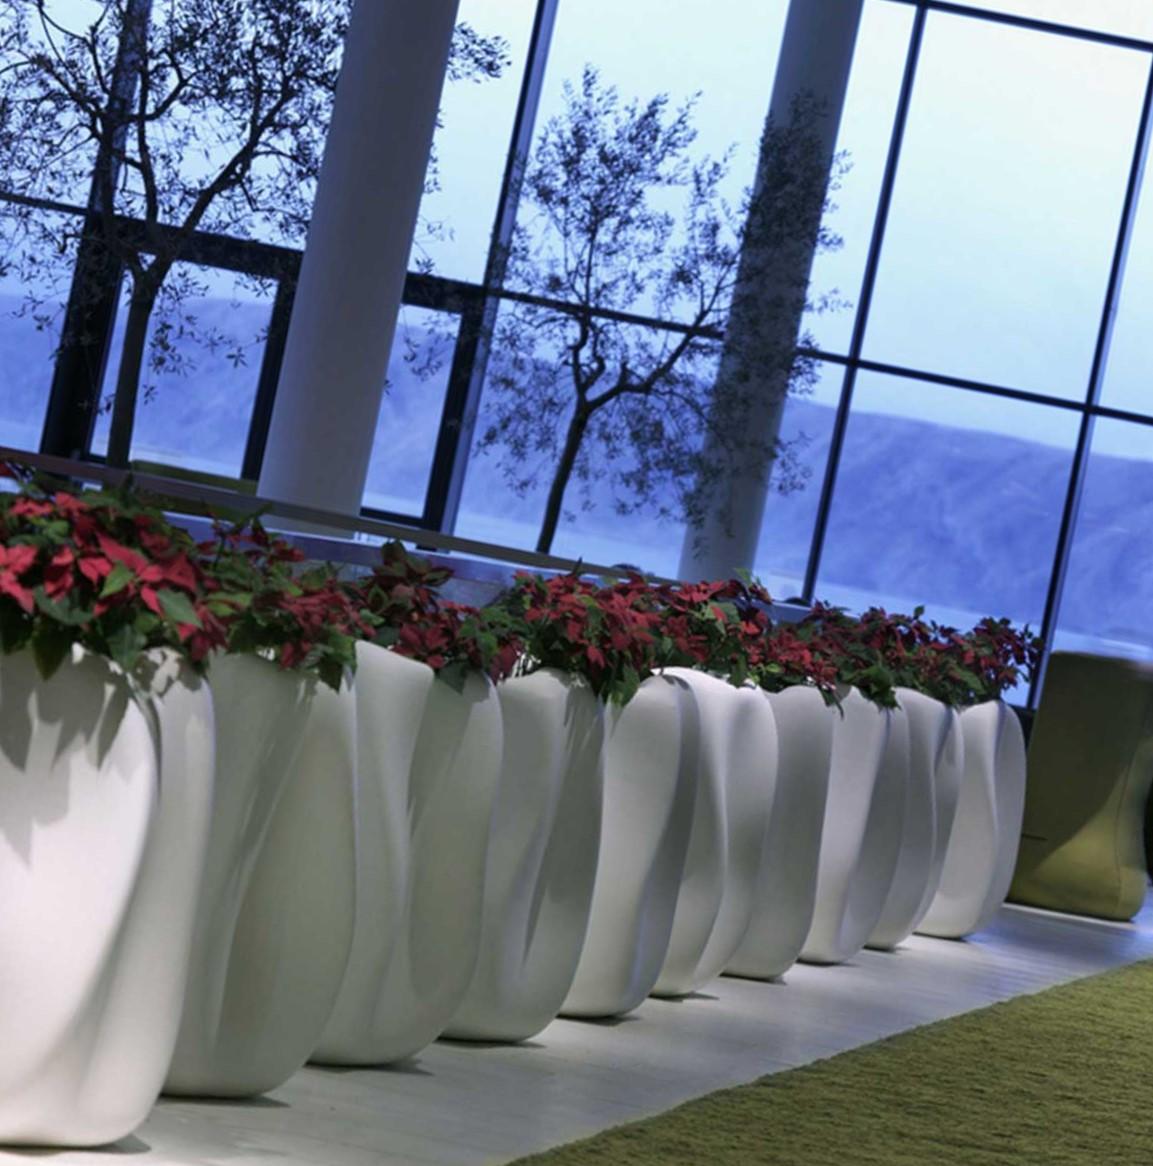 Vasi moderni per chi cerca. Vendita Vasi Di Design Per Piante A Como Linea Verde